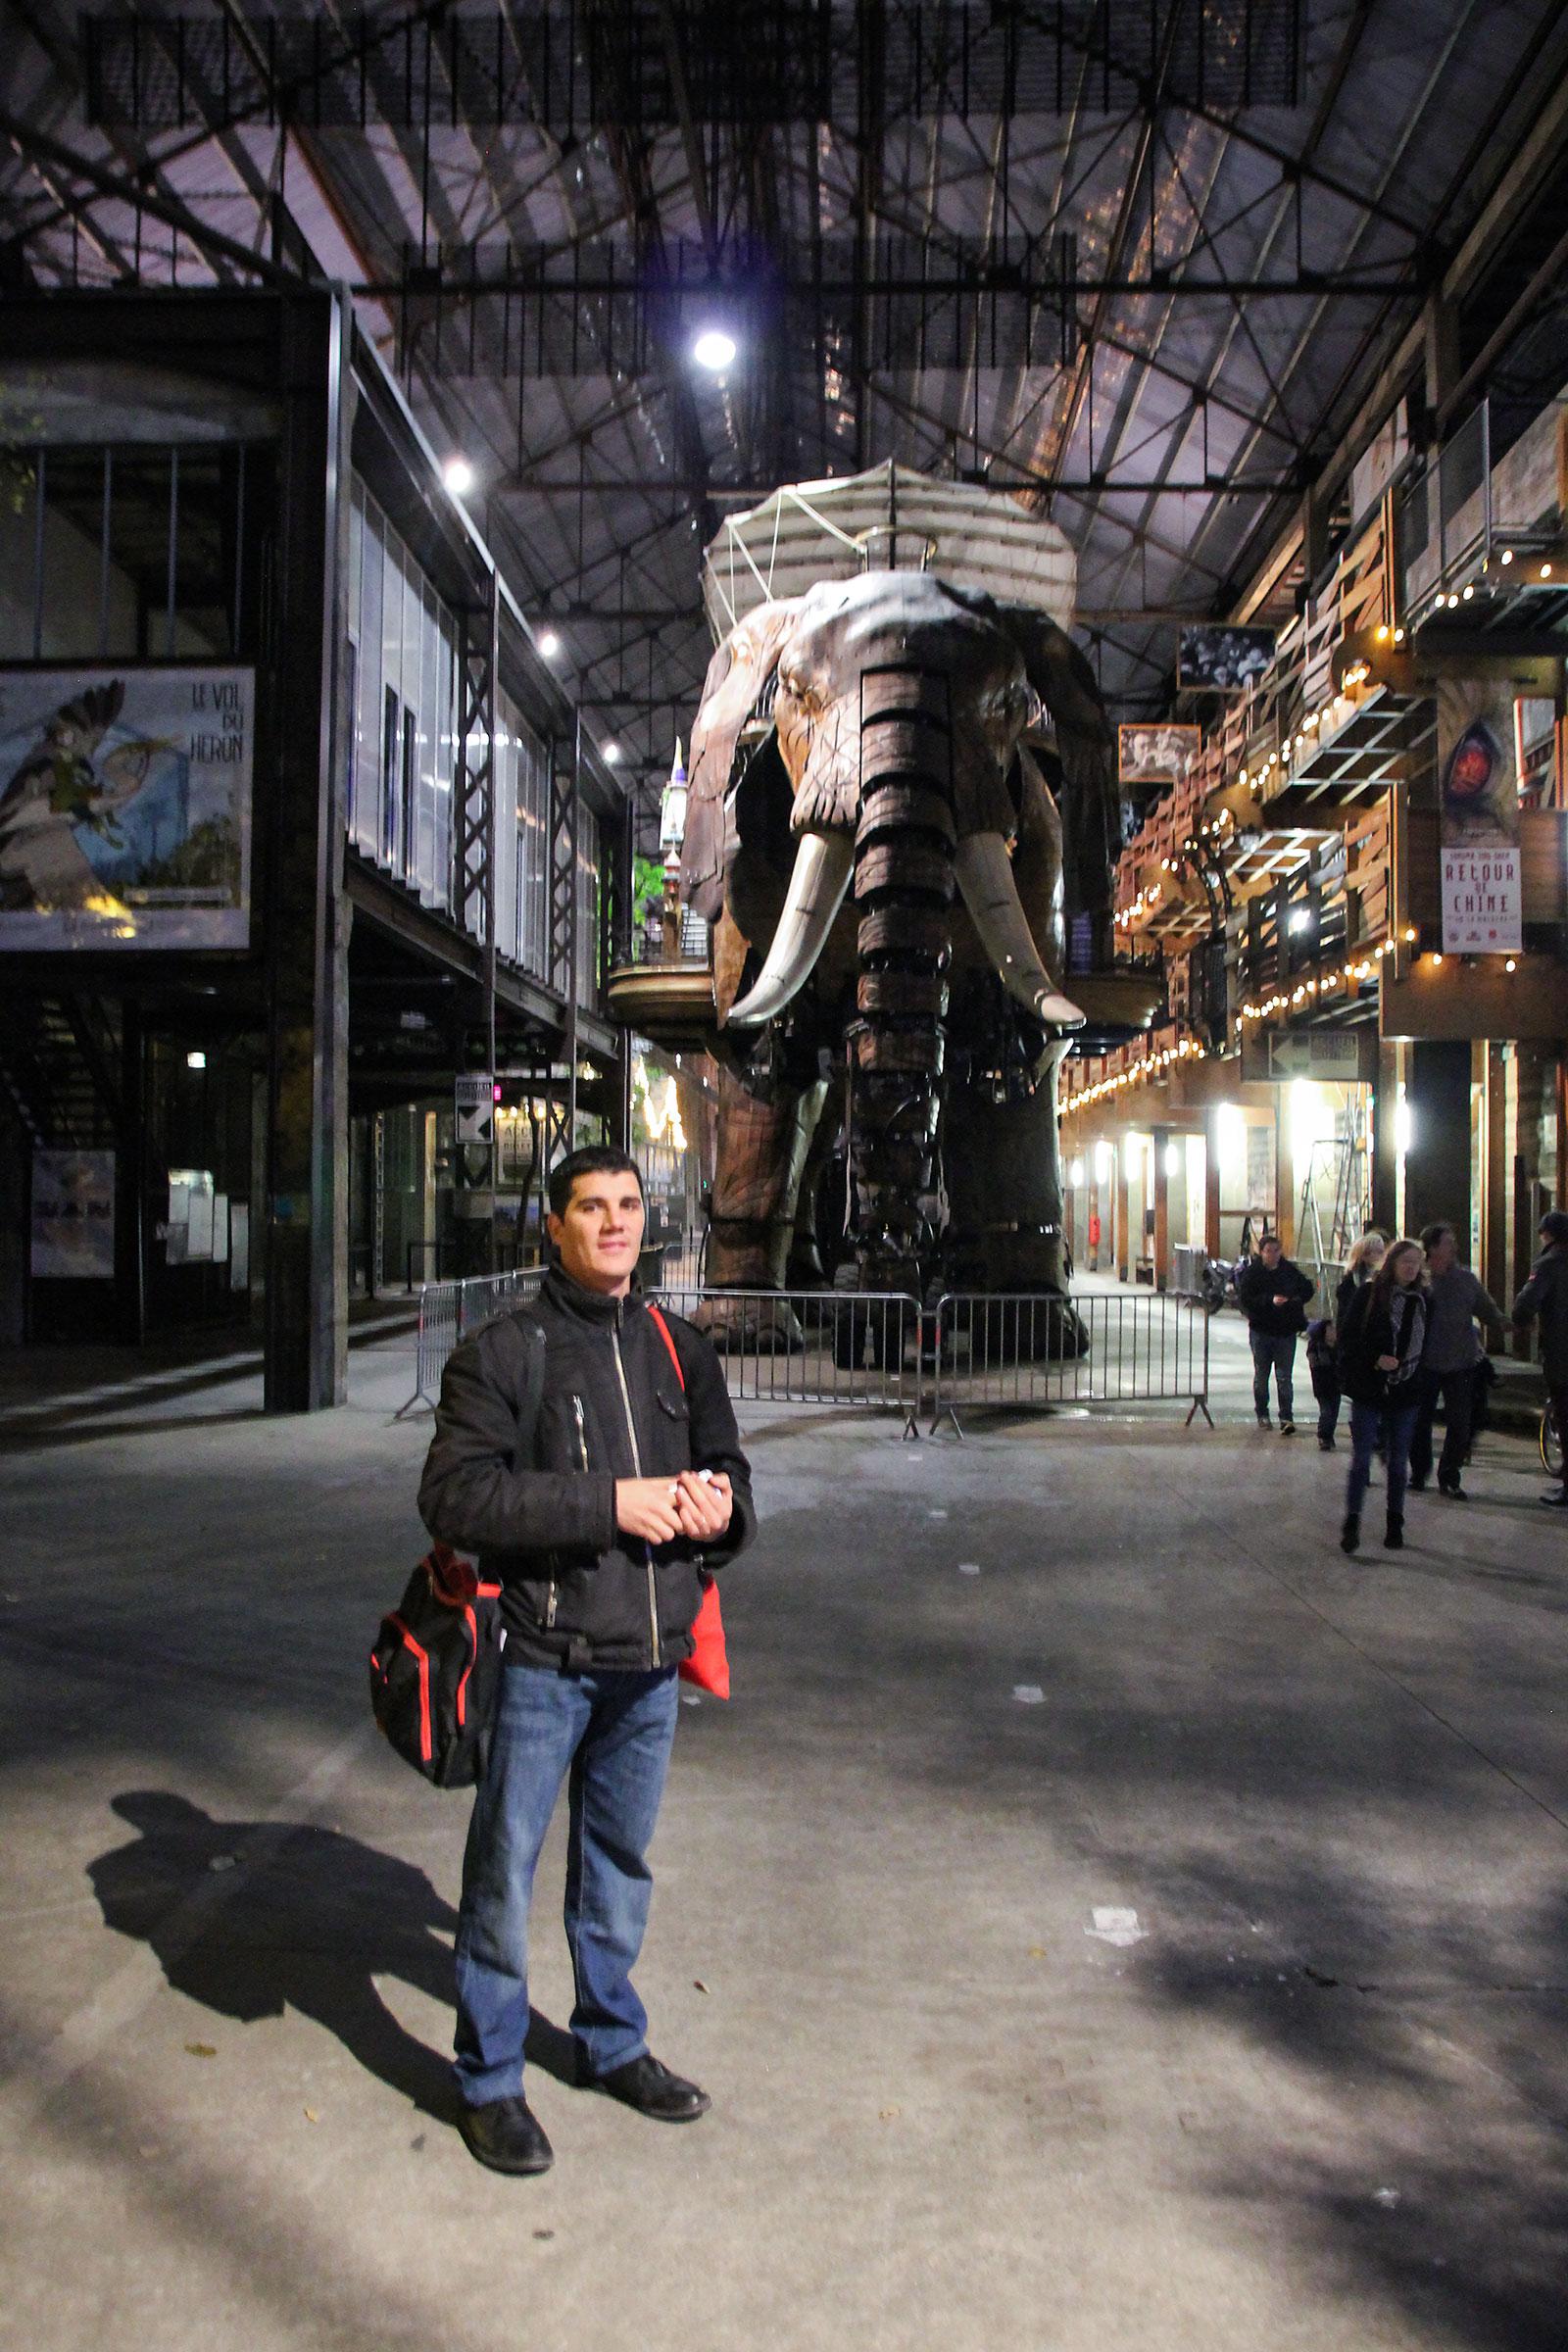 Thomas and the Elephant